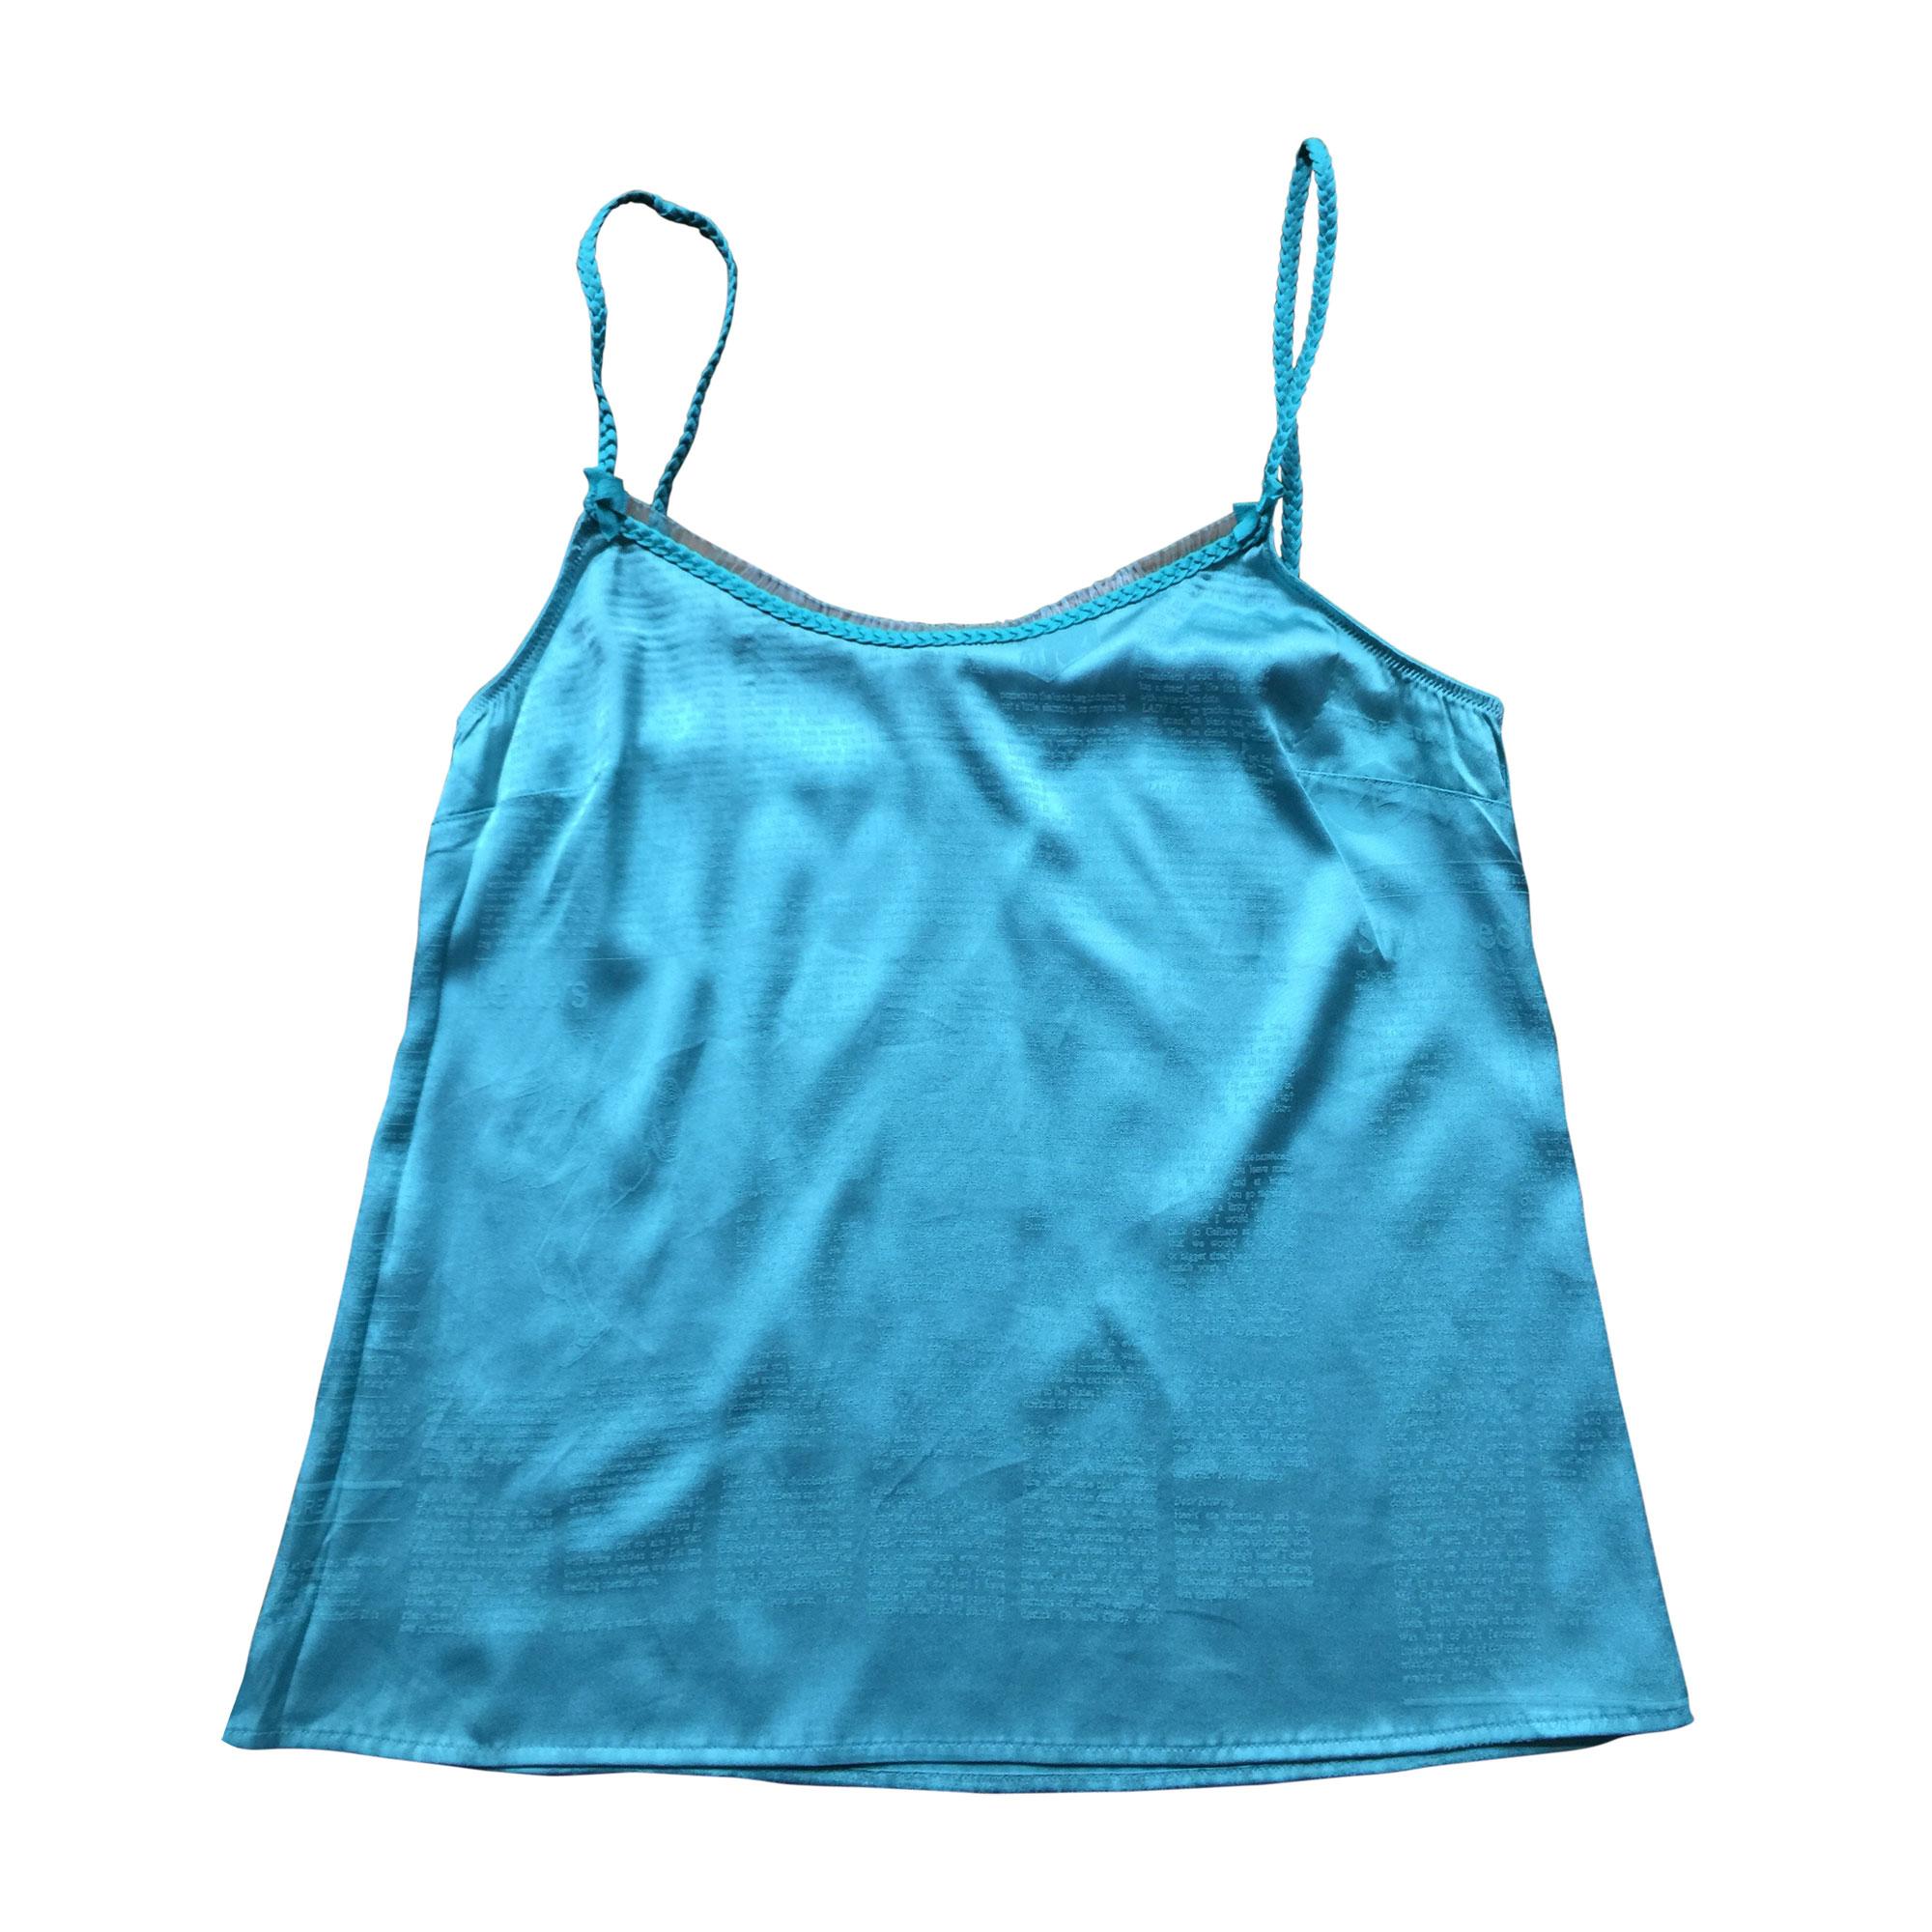 Top, tee-shirt JOHN GALLIANO Bleu, bleu marine, bleu turquoise